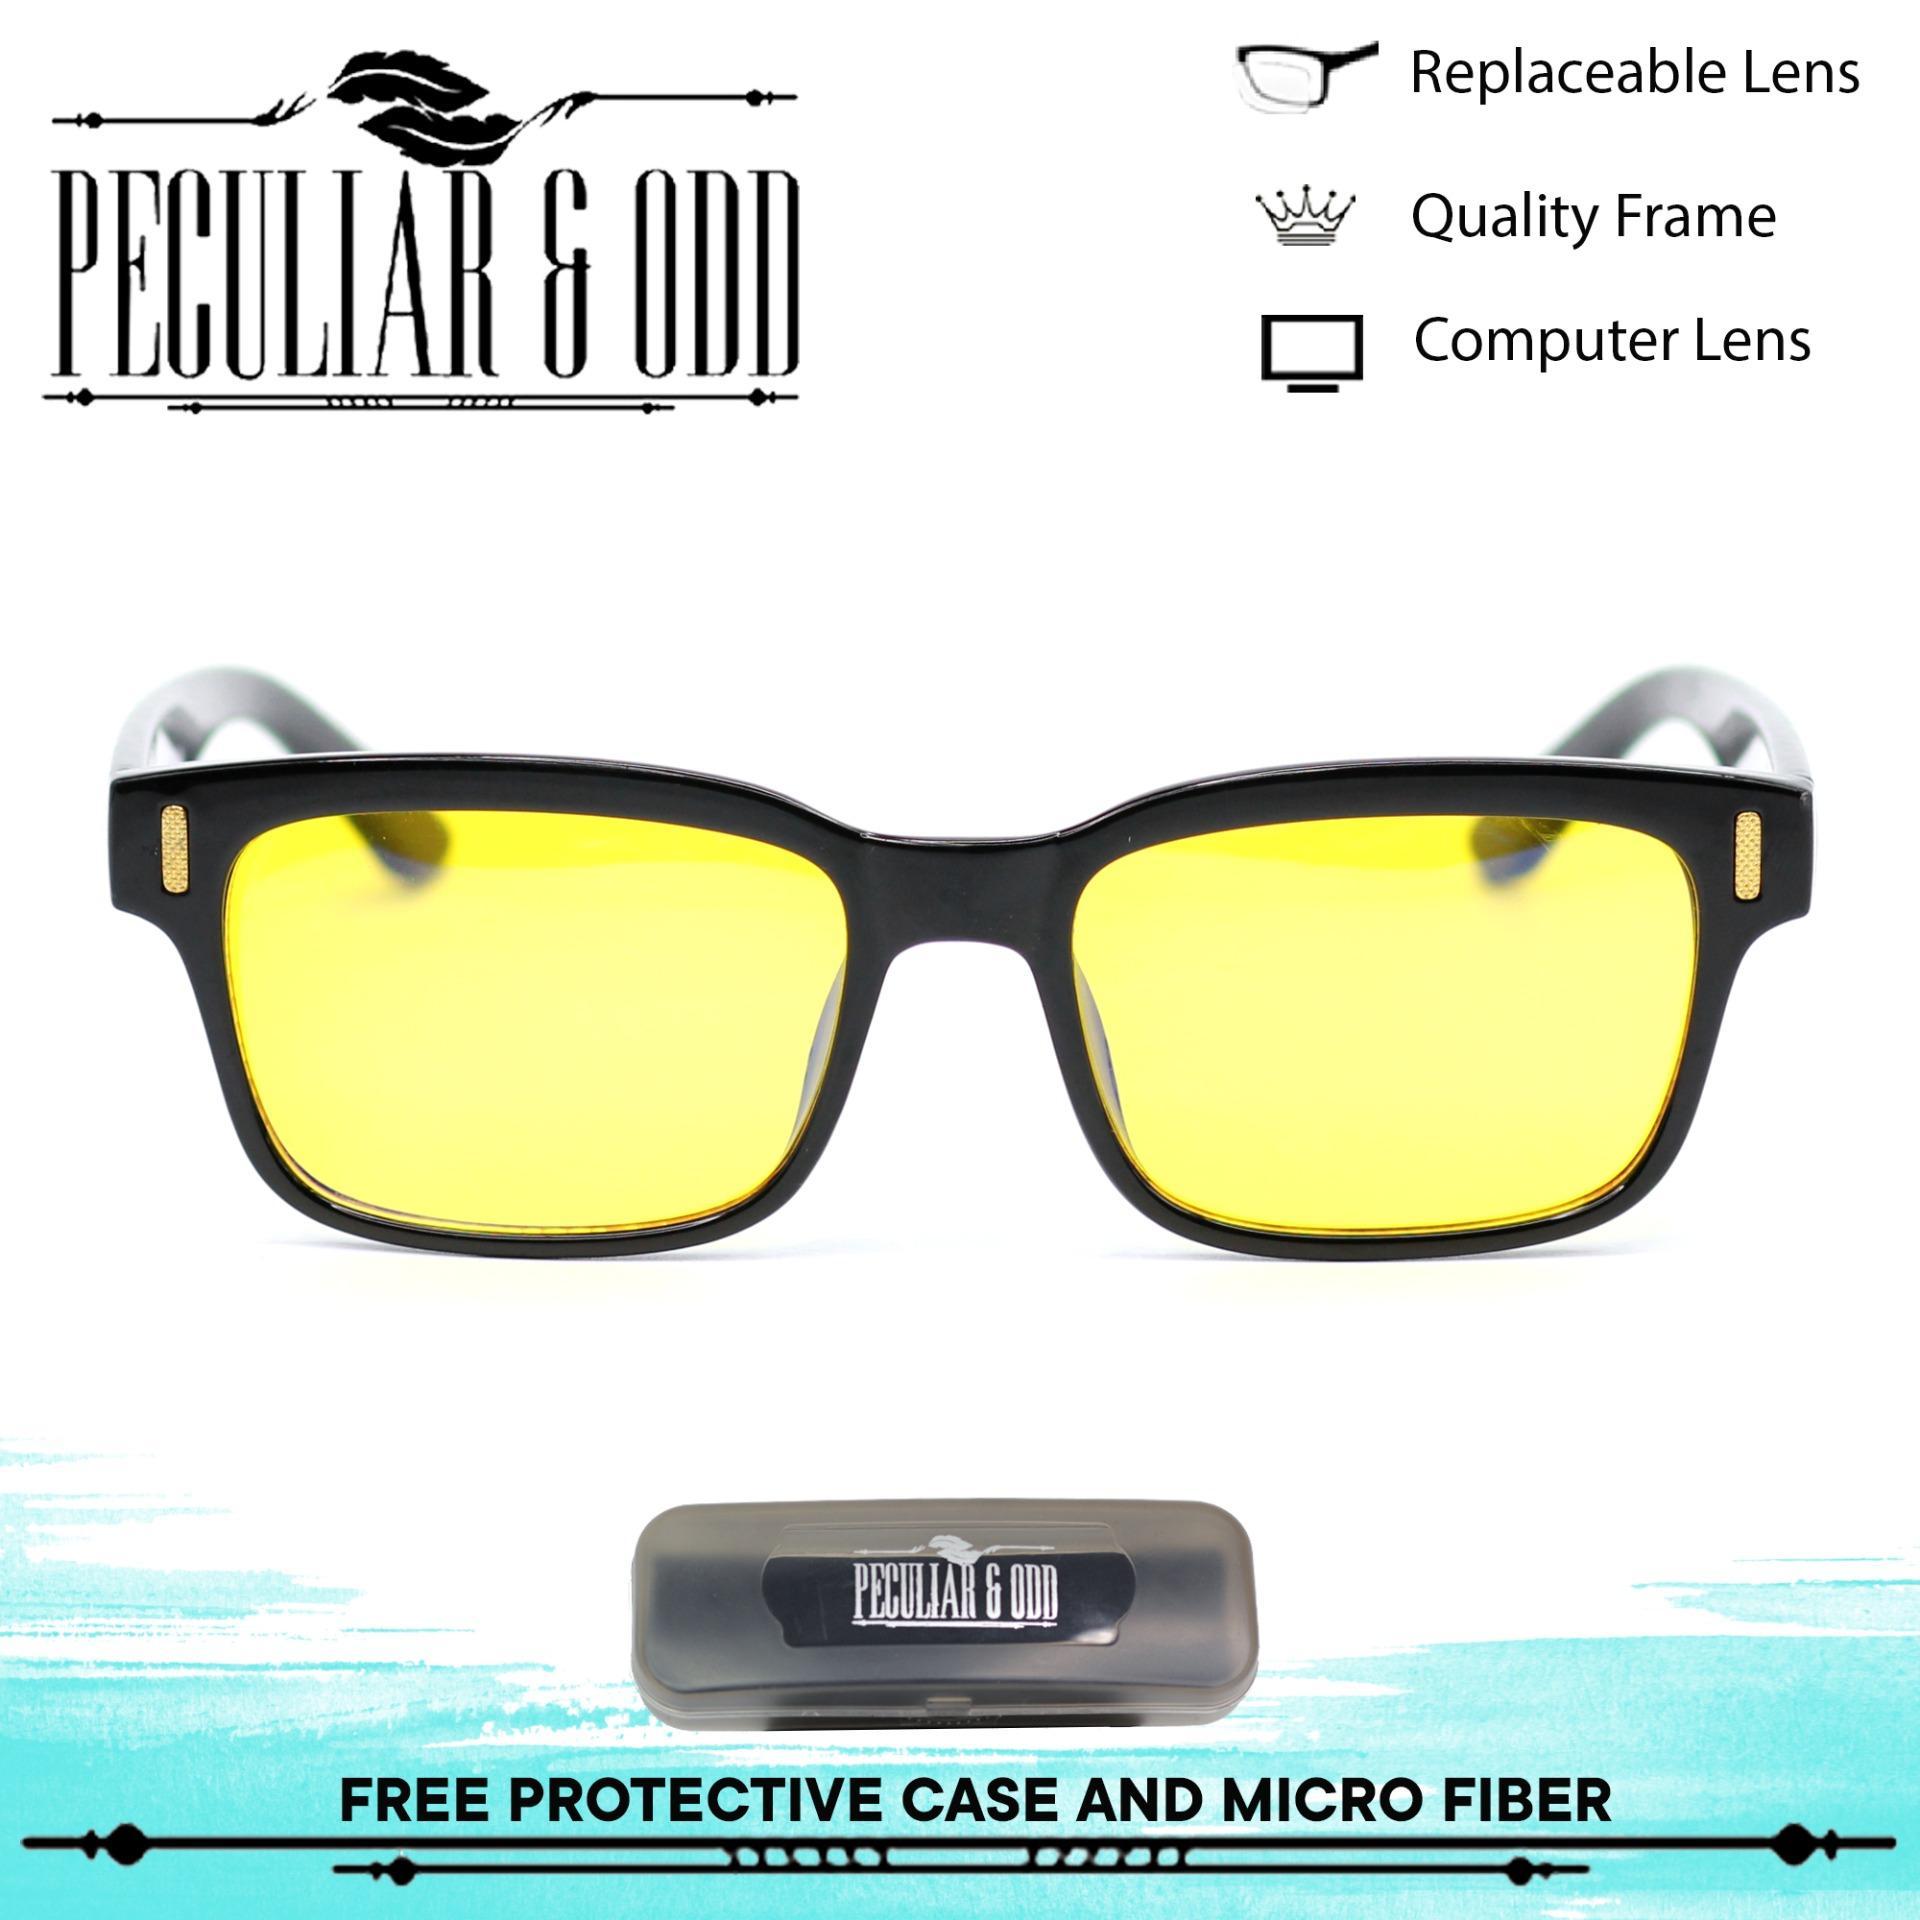 9103e1e658 Peculiar Square 8084 BlackYellow Anti Radiation Computer Eyeglass   Driving  Optical Replaceable Lens Unisex Eyewear